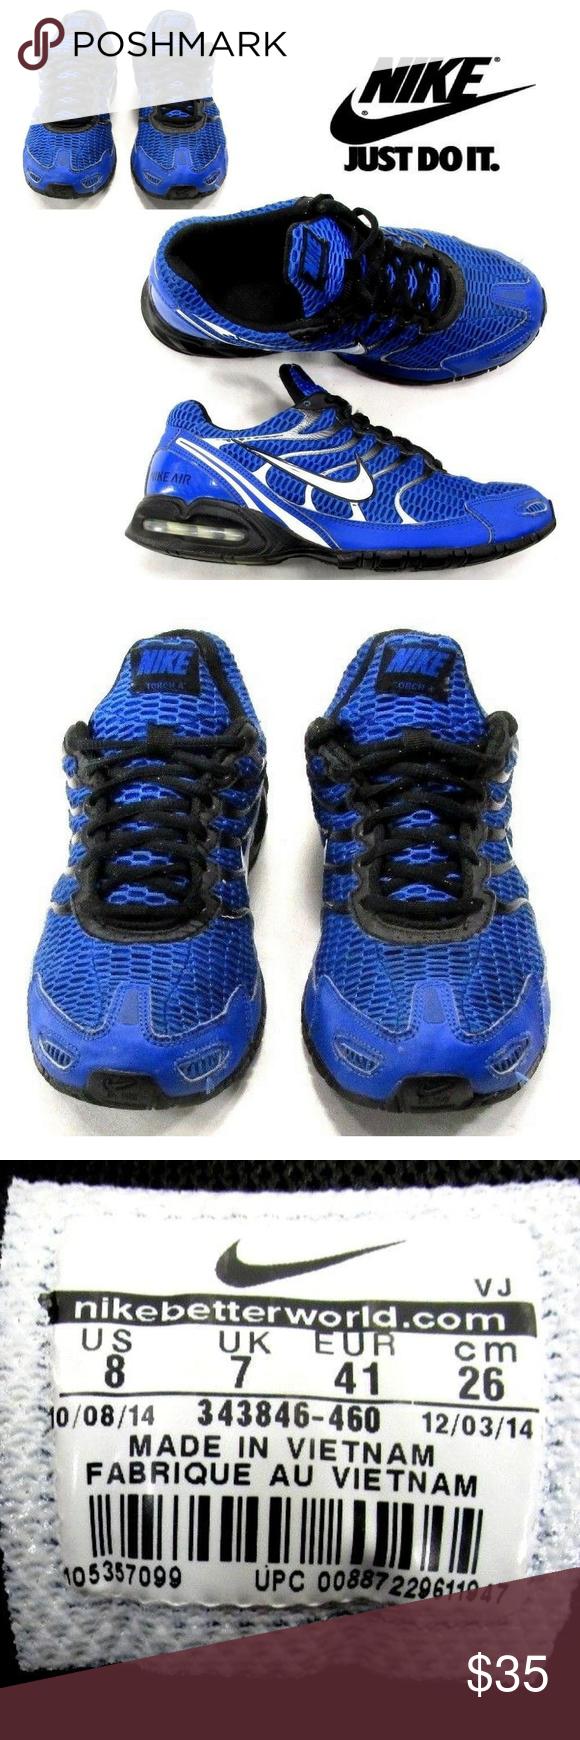 NIKE AIR MAX Torch 4 IV Men's 8 Running Shoes S3 NIKE AIR